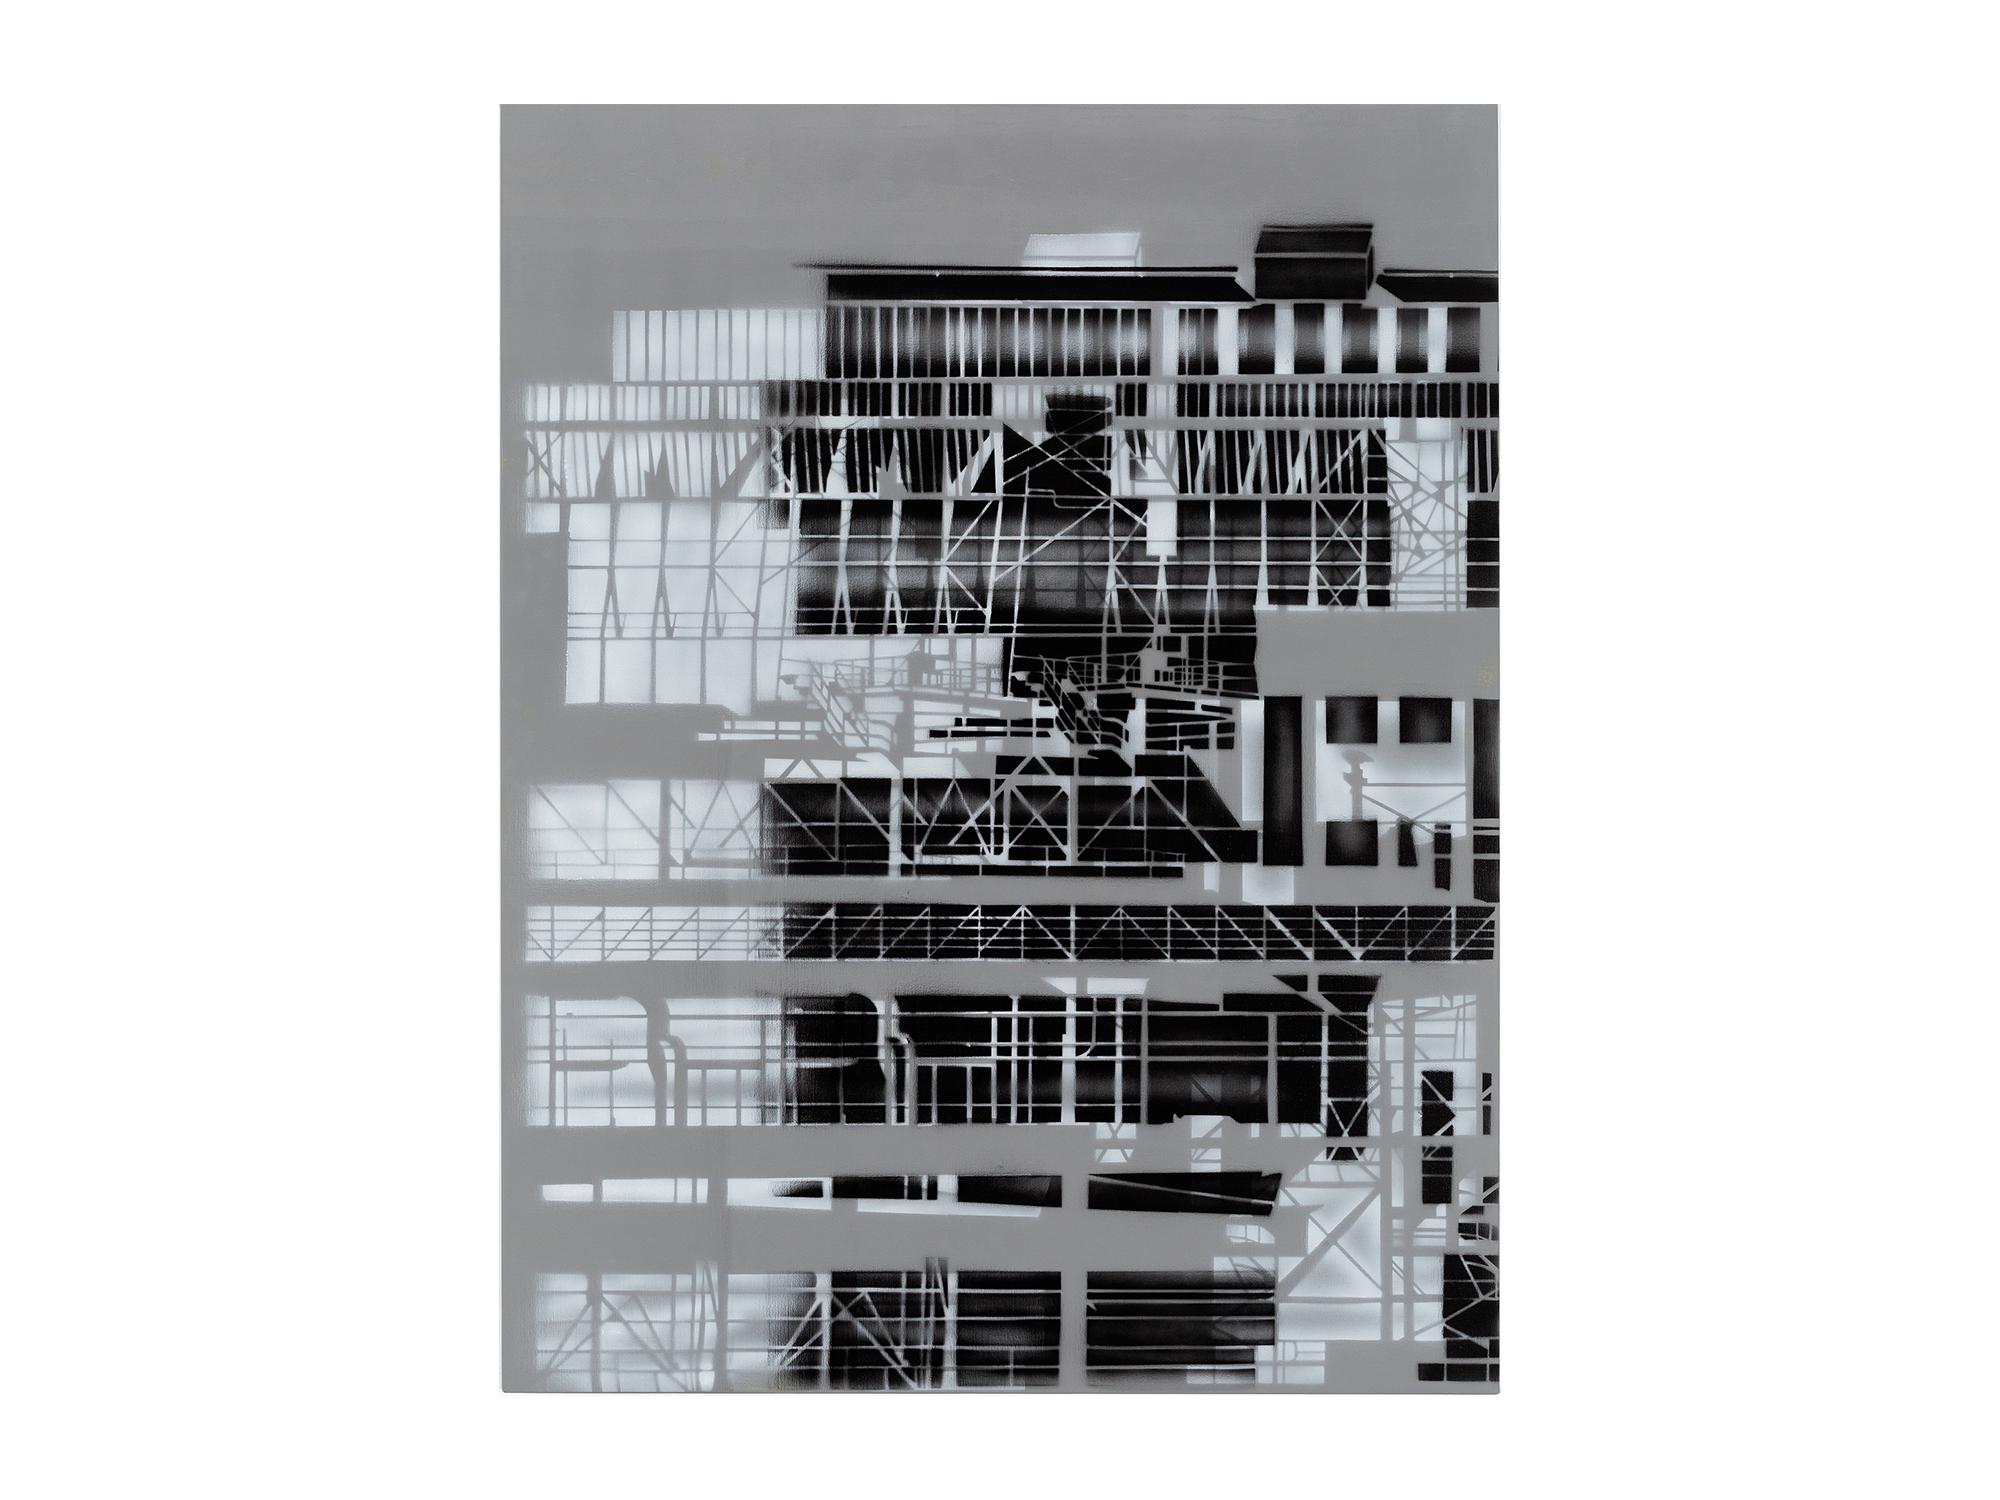 Louise Forthun   Double Zinc,  2018 acrylic on linen 150 x 116cm   ARTIST BIO